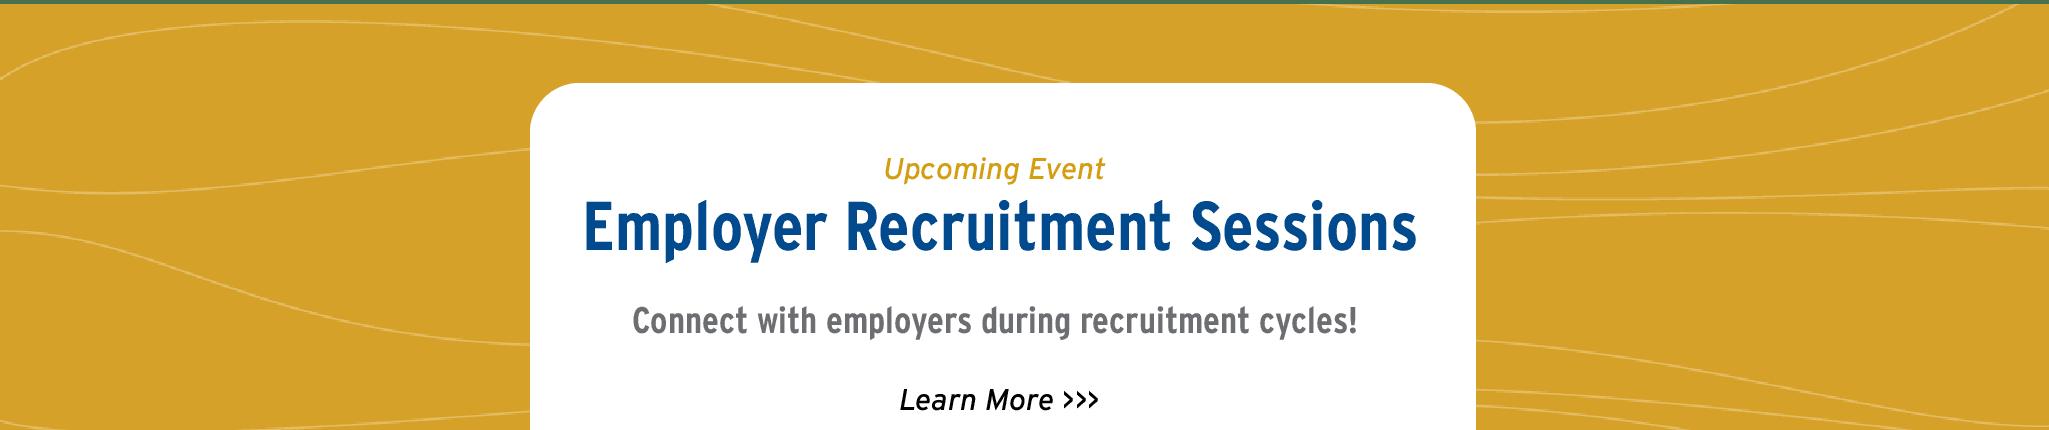 Recruitment Sessions